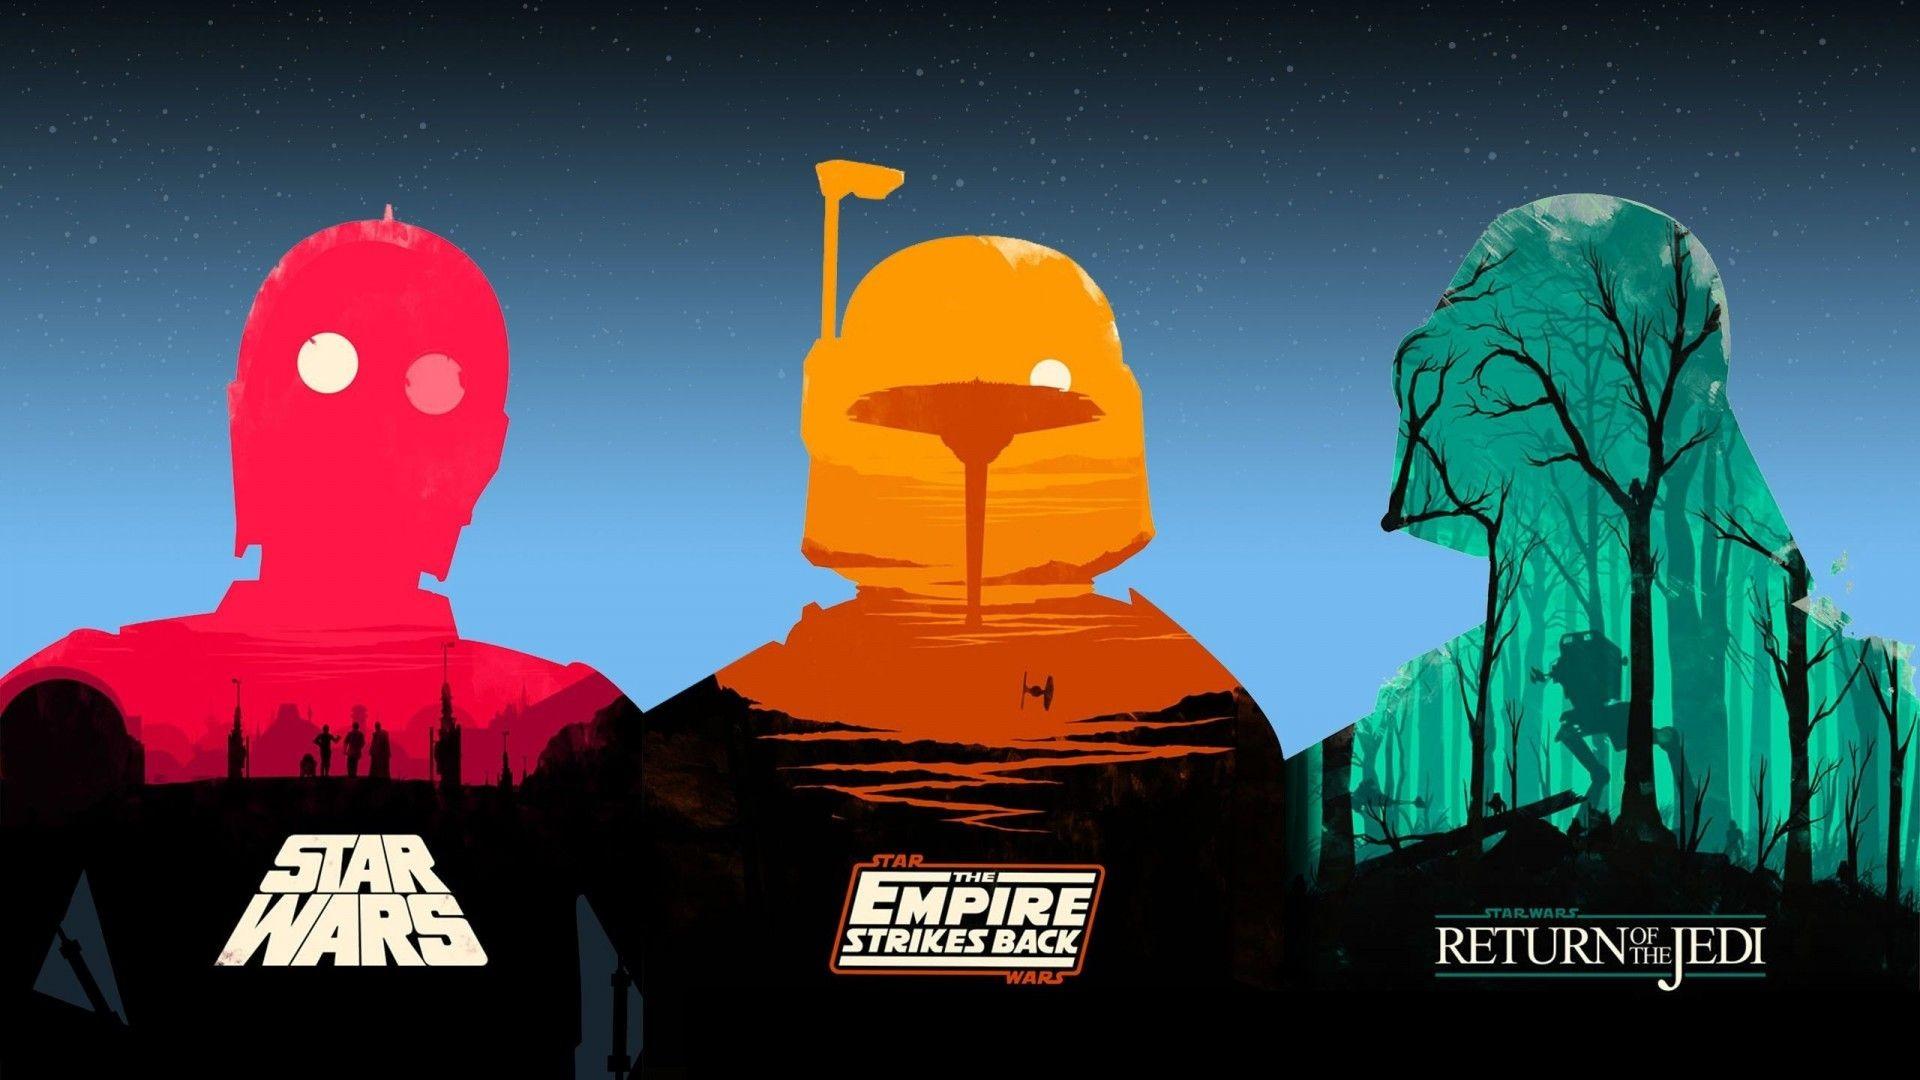 Star Wars Wallpapers – Wallpaper Cave